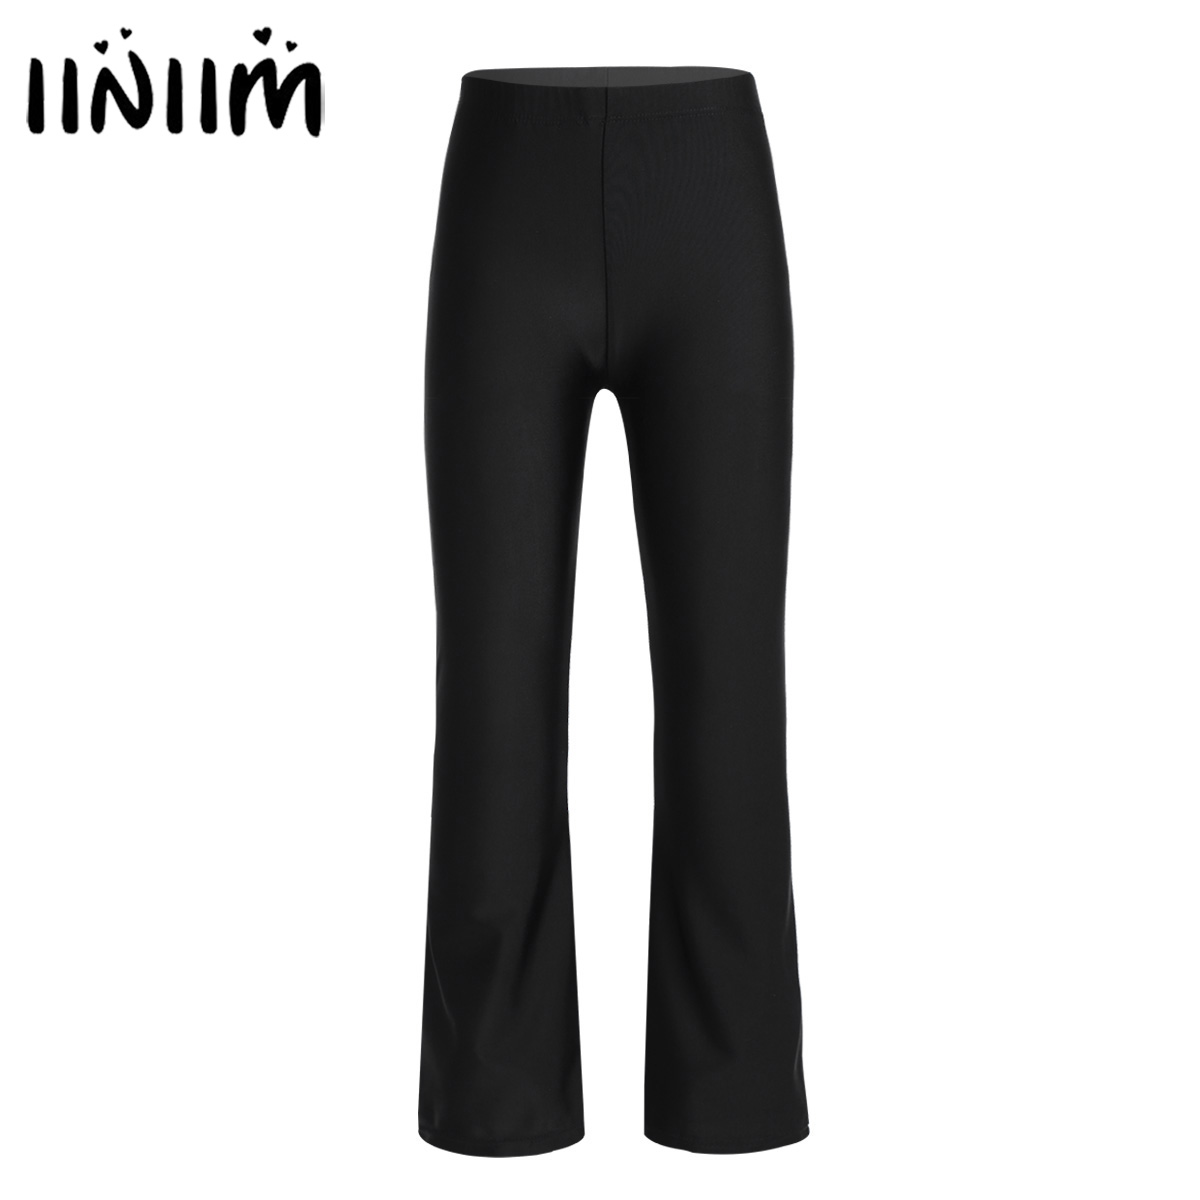 Iiniim Kids Girls Classic Dance Wear Stretchy Loose Pants Dancewear For Jazz Dance Gymnastics Leotard Costumes Pants